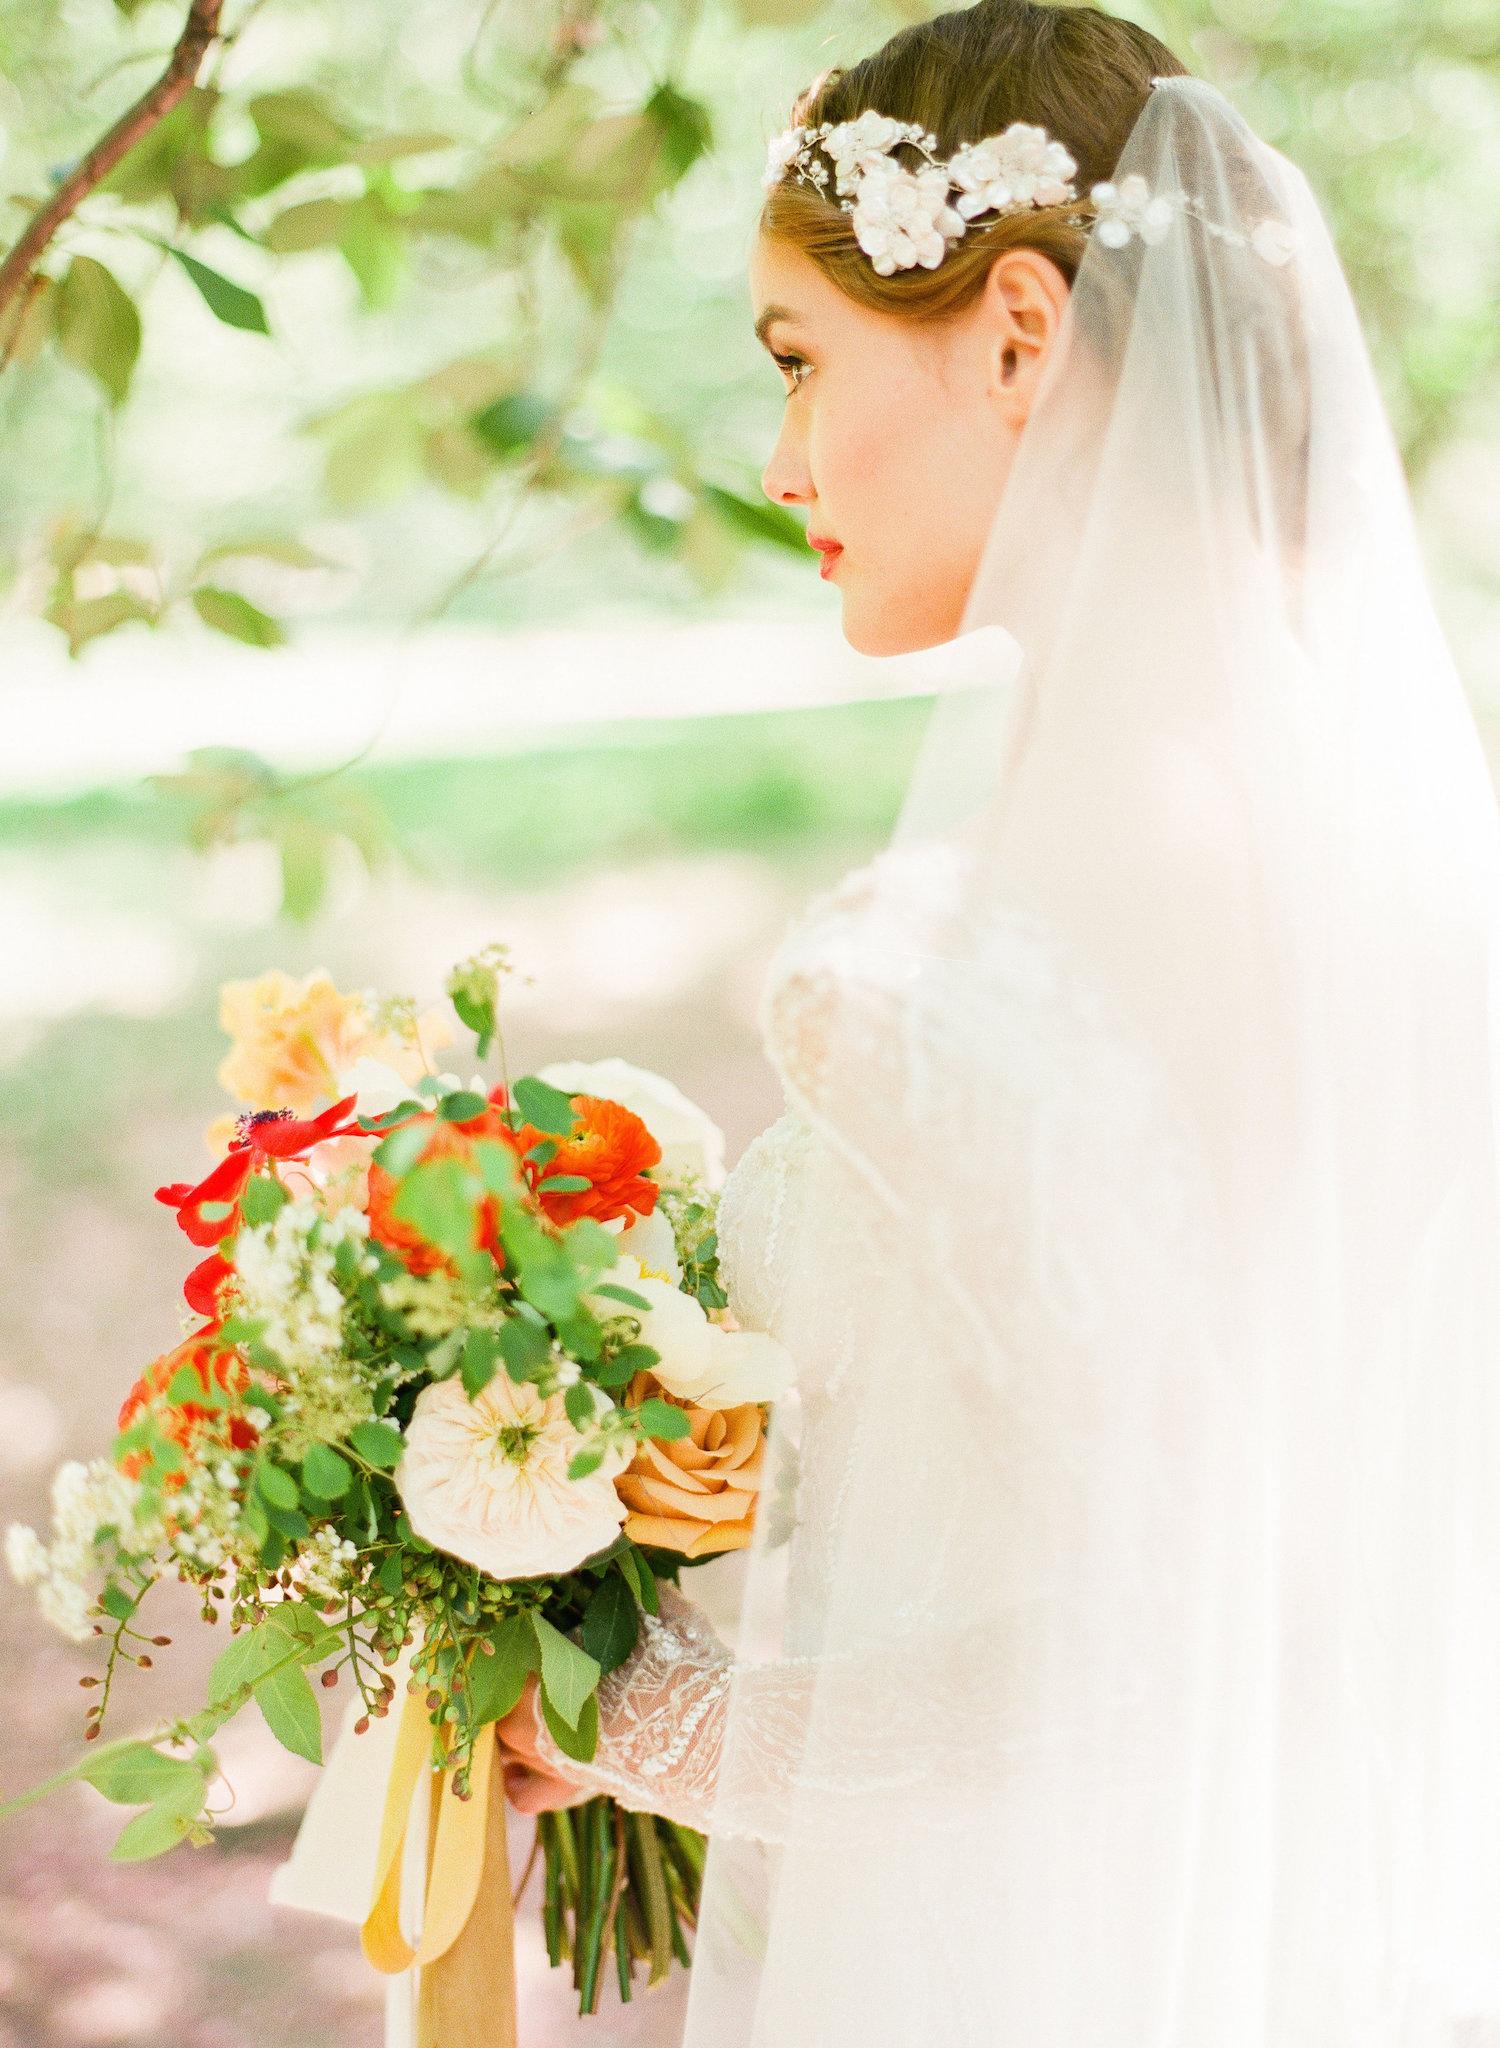 Morning Glow - Full Aperture Floral & Lindsay Madden Photography 14.jpeg